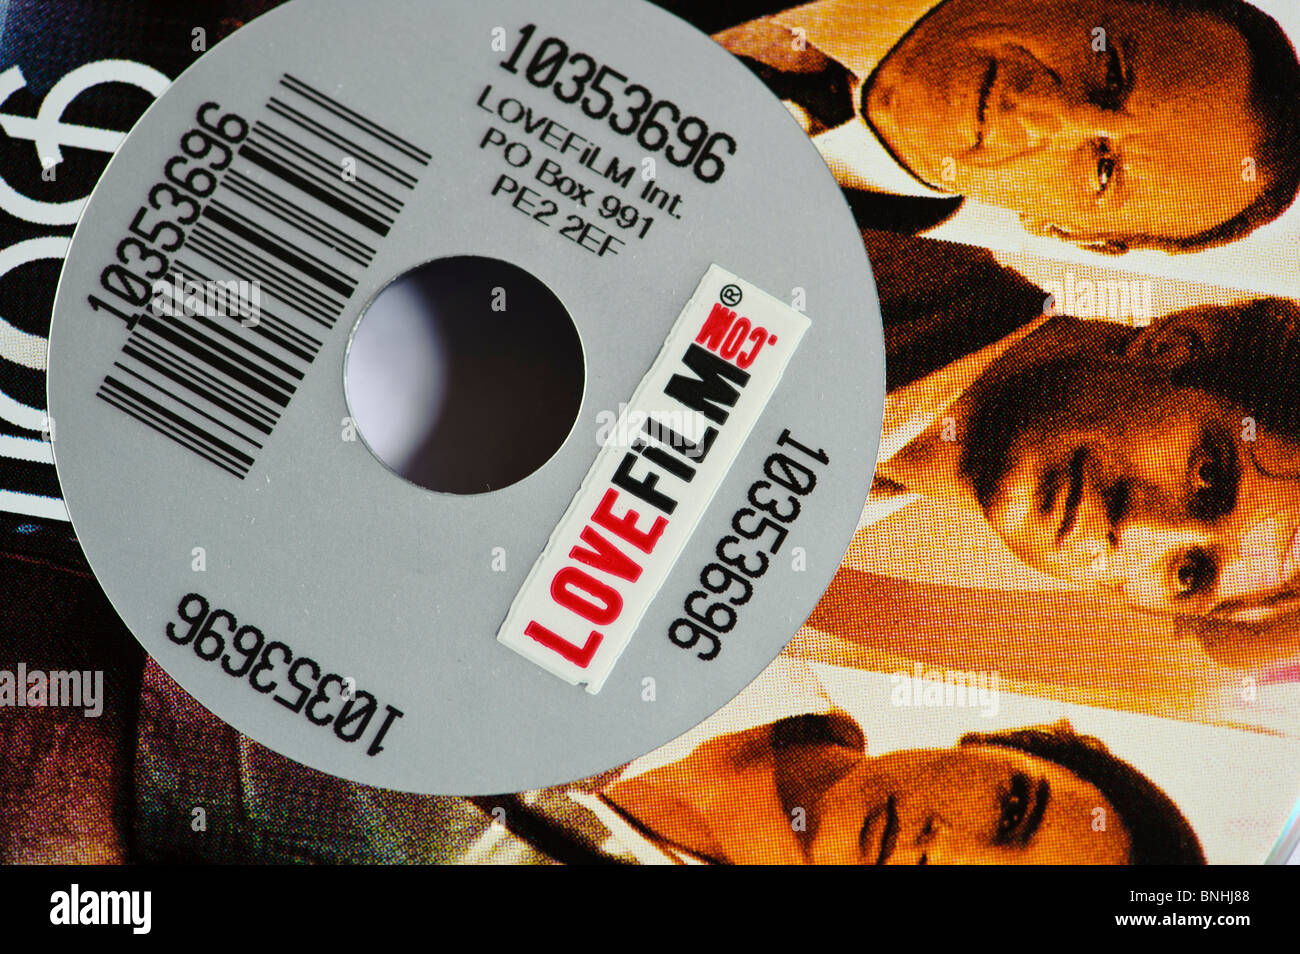 Lovefilm.com dvd rental by post, UK - Stock Image